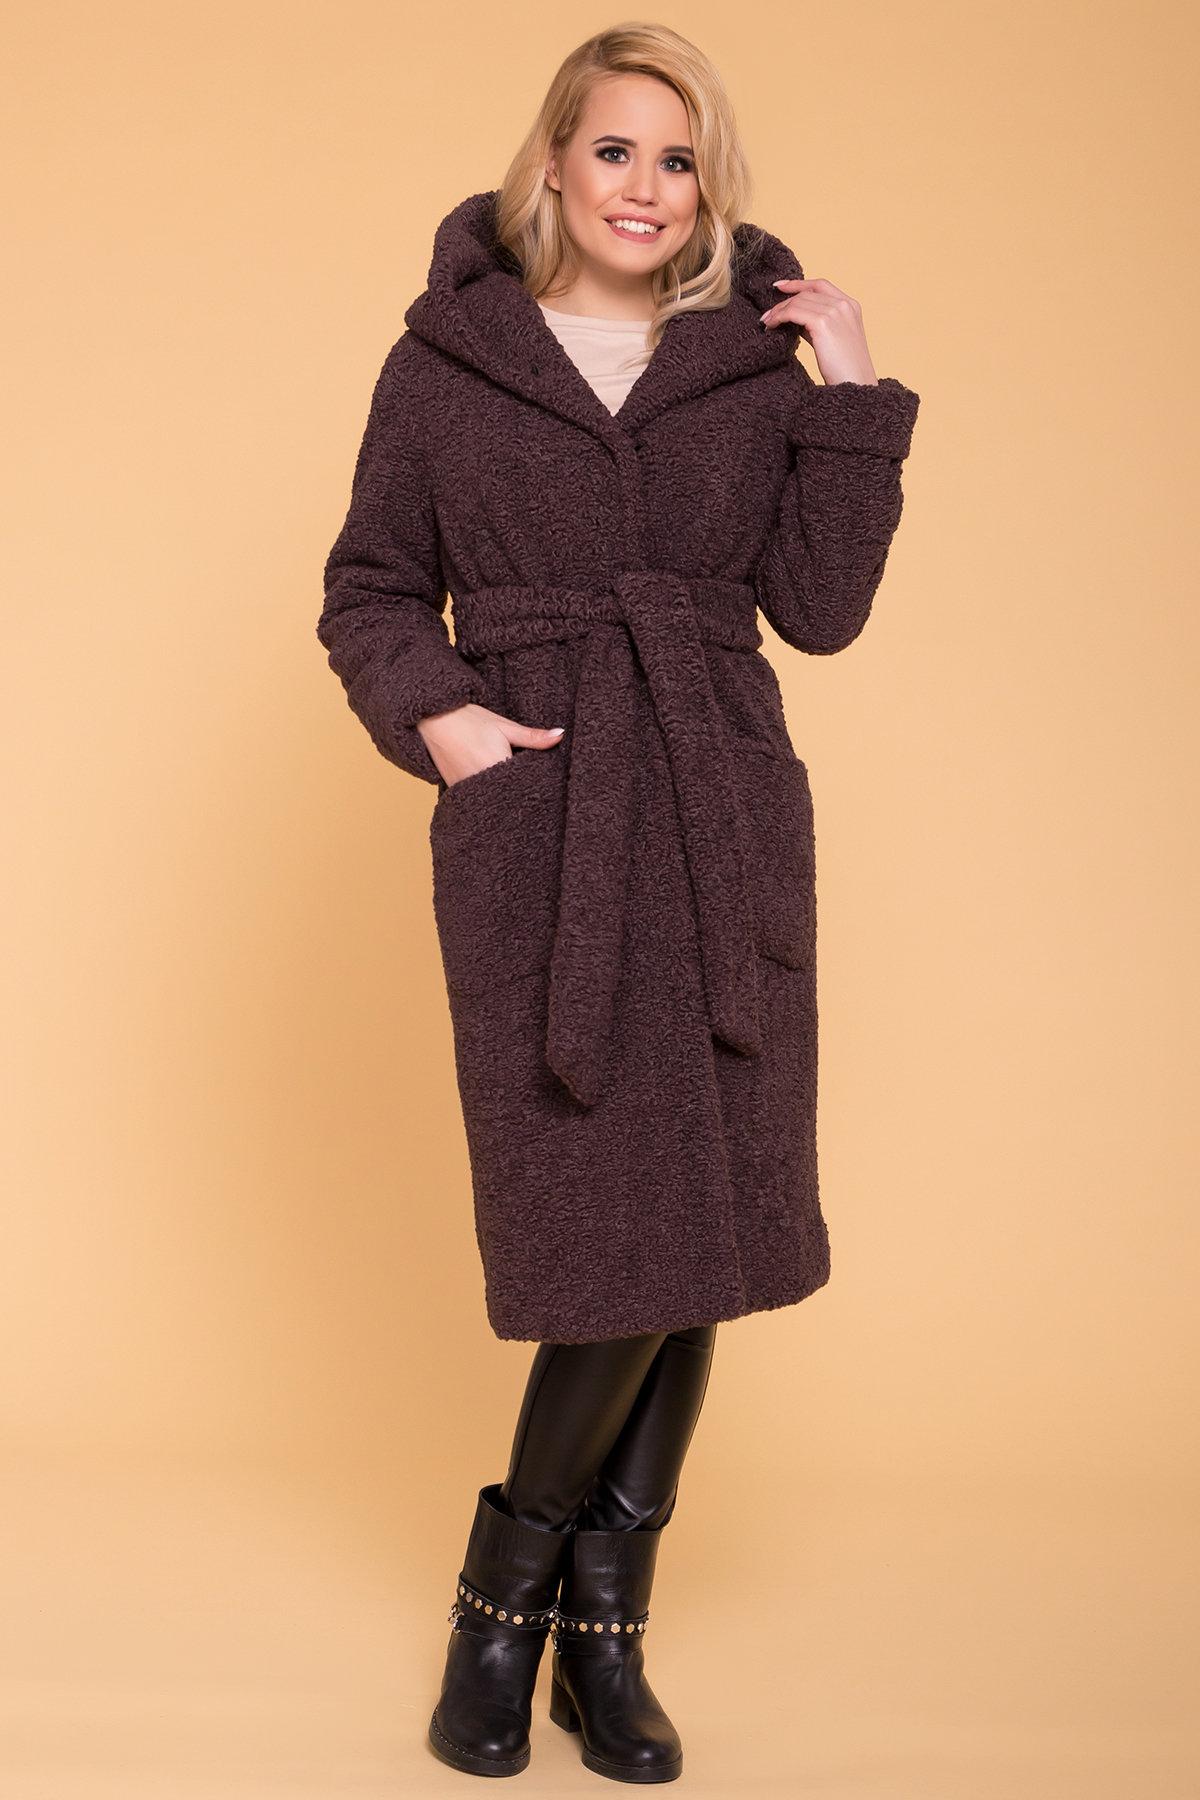 Пальто меховое зима Анита 6002 Цвет: Шоколад